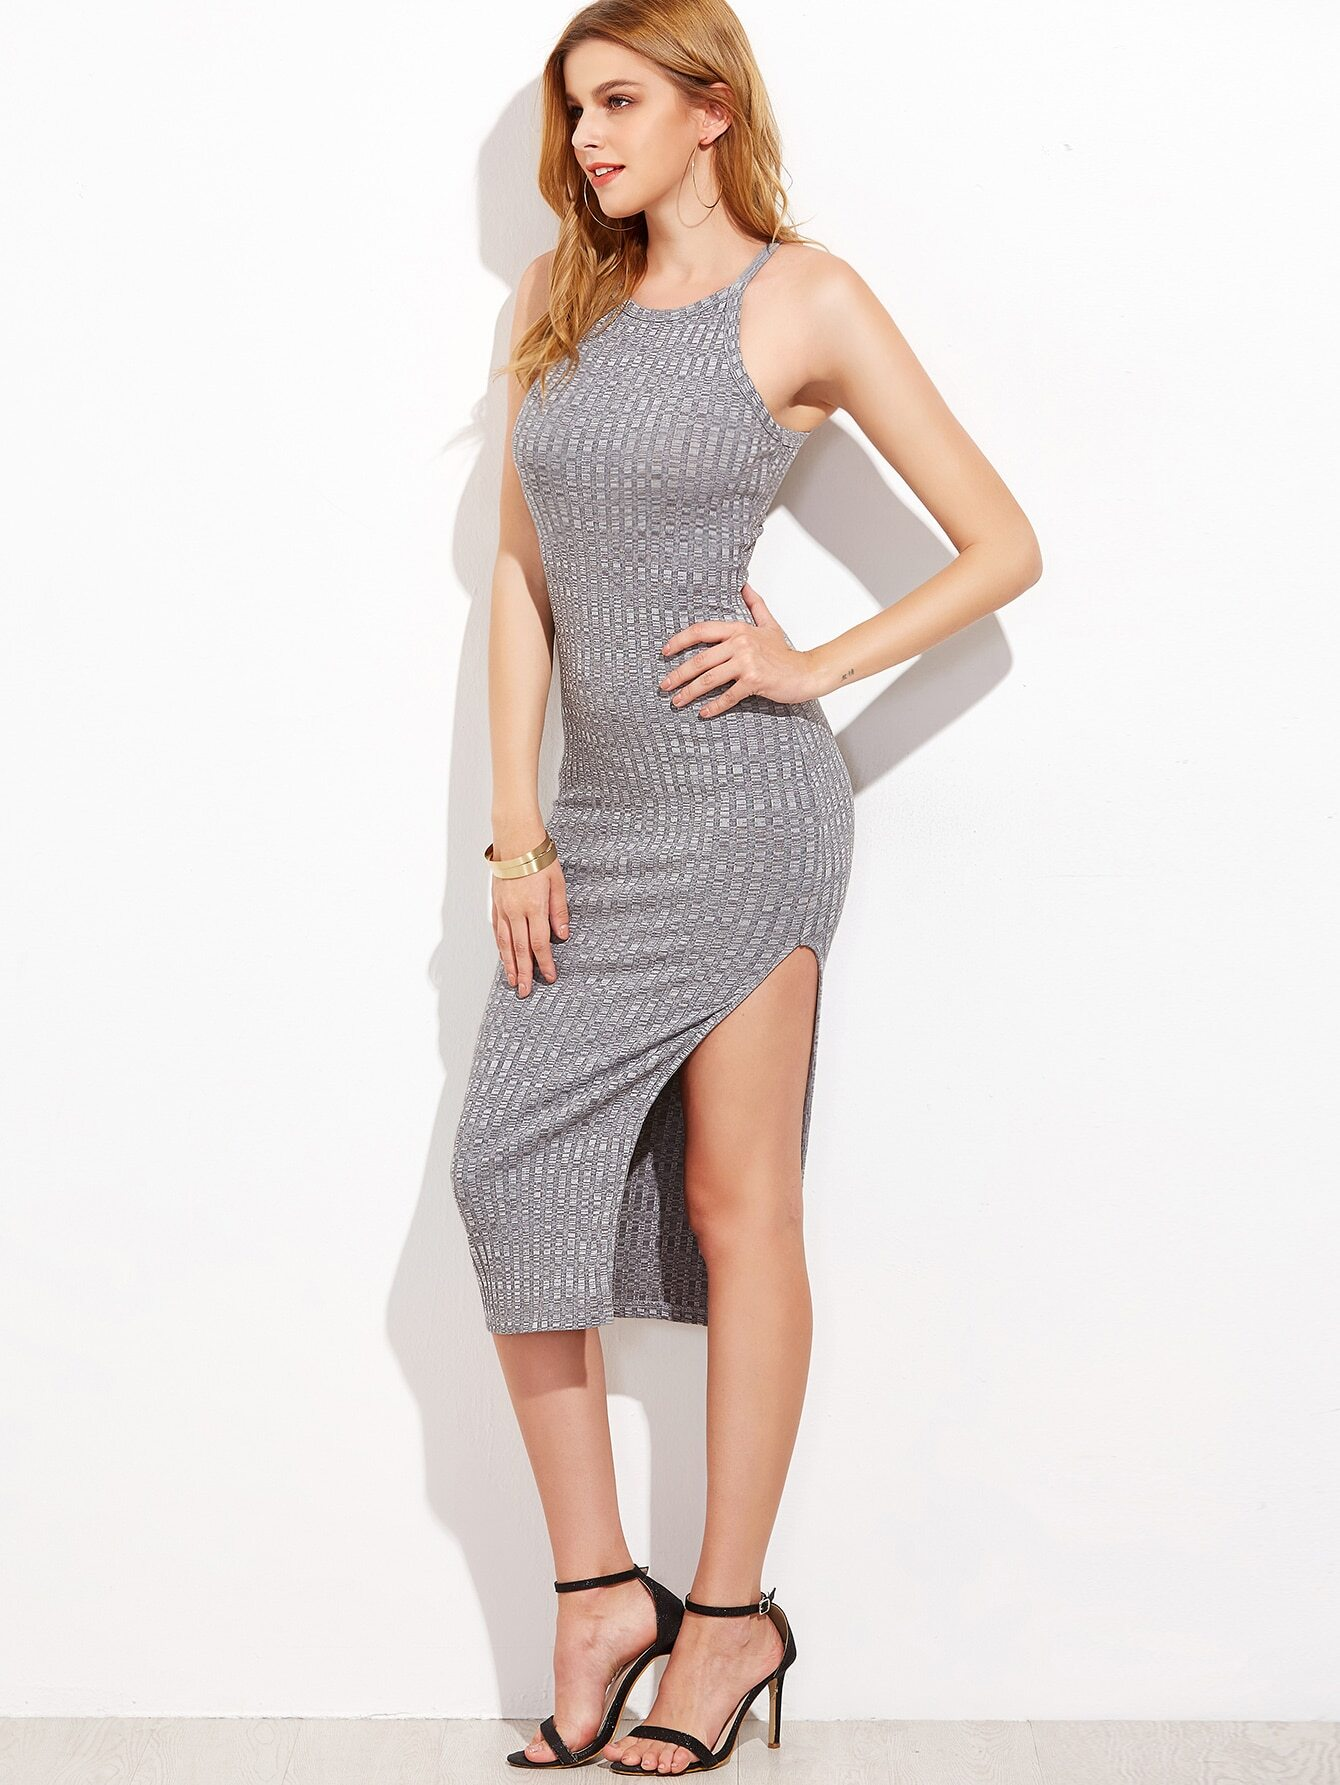 Heather Grey Side Slit Ribbed Cami Dress dress161118726